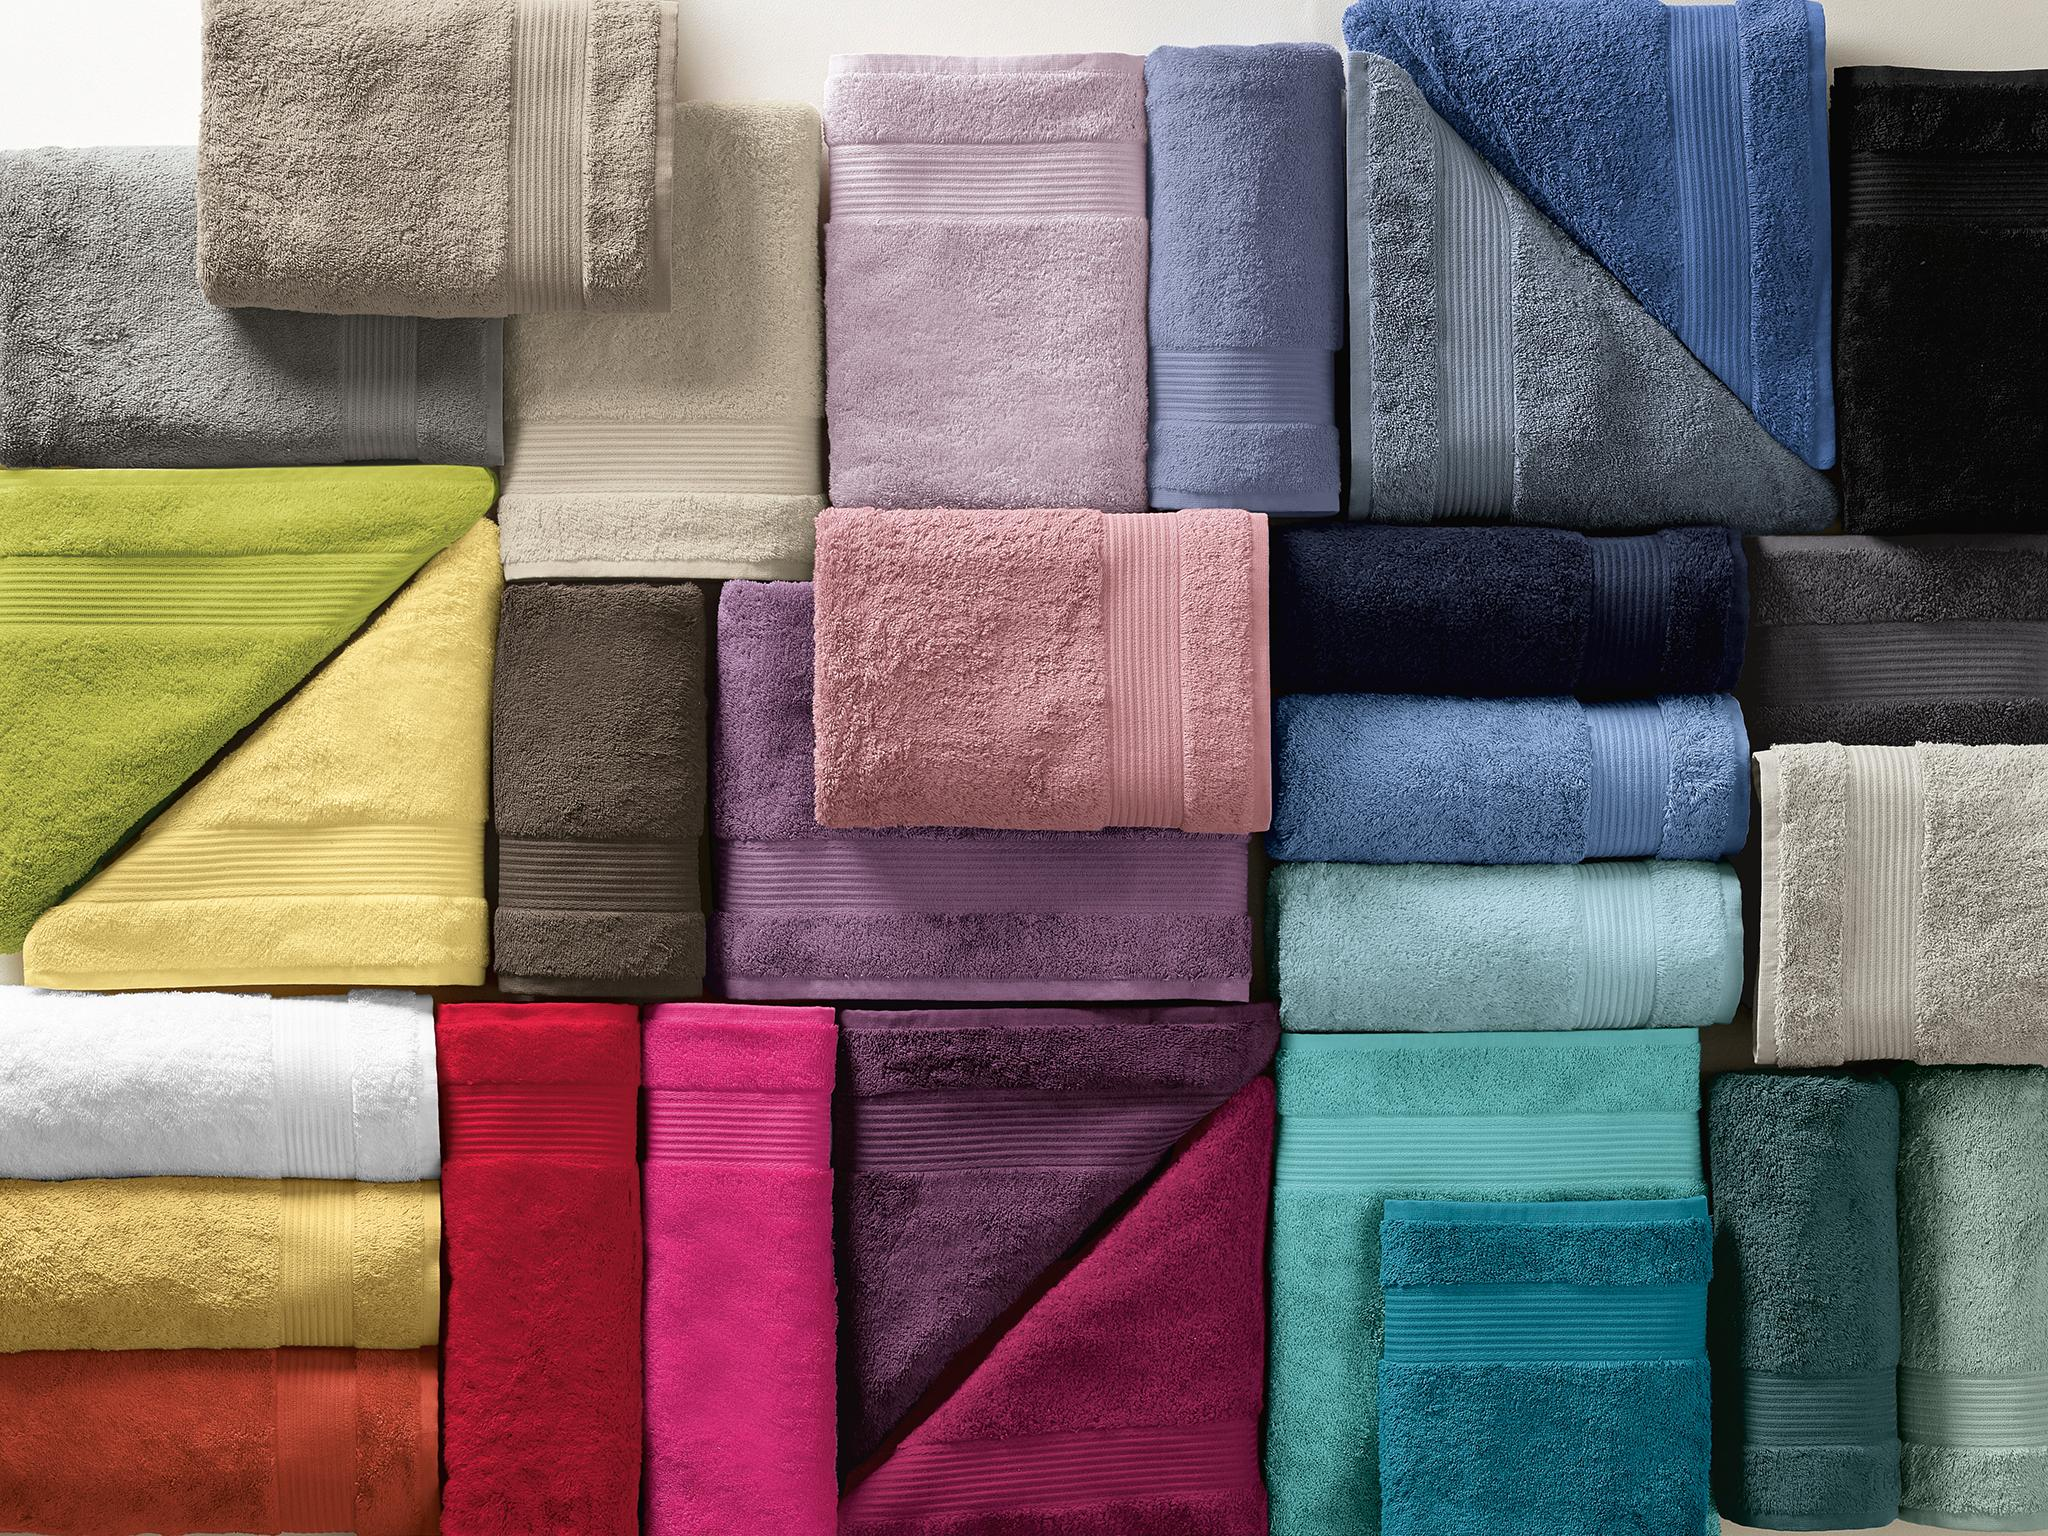 043a04e642 10 best bath towels